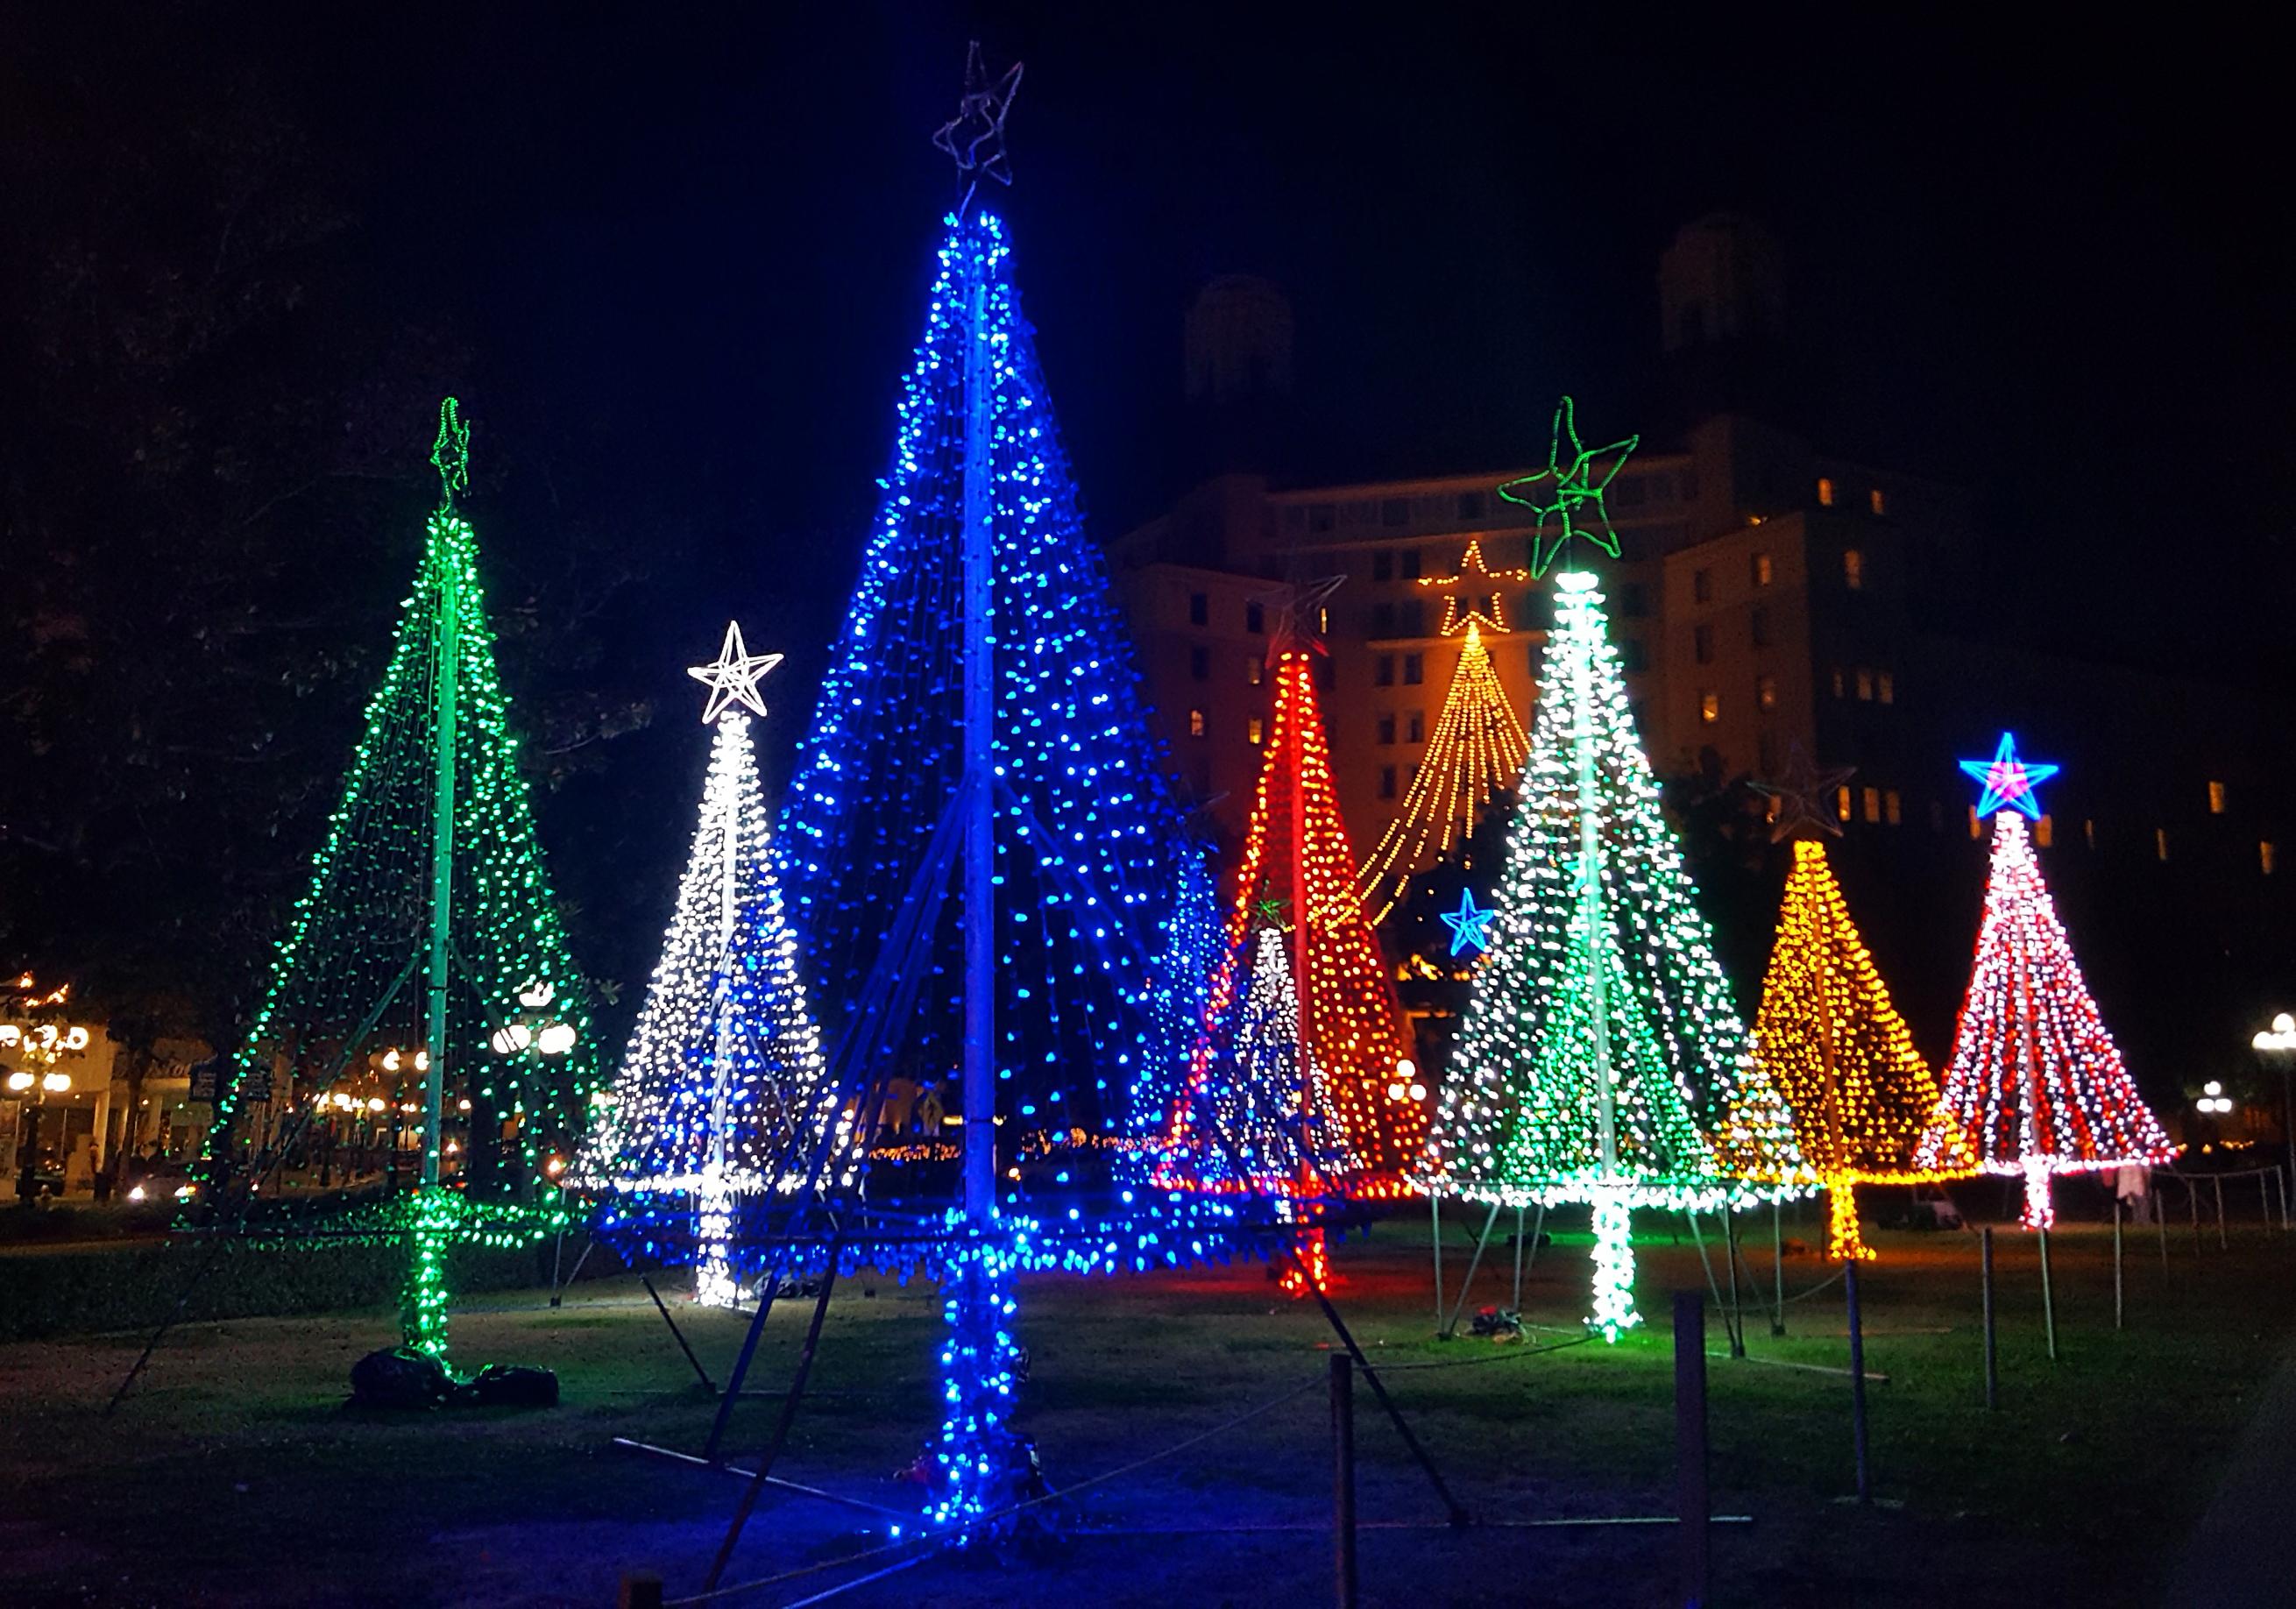 Christmas lights in Hot Springs, Arkansas